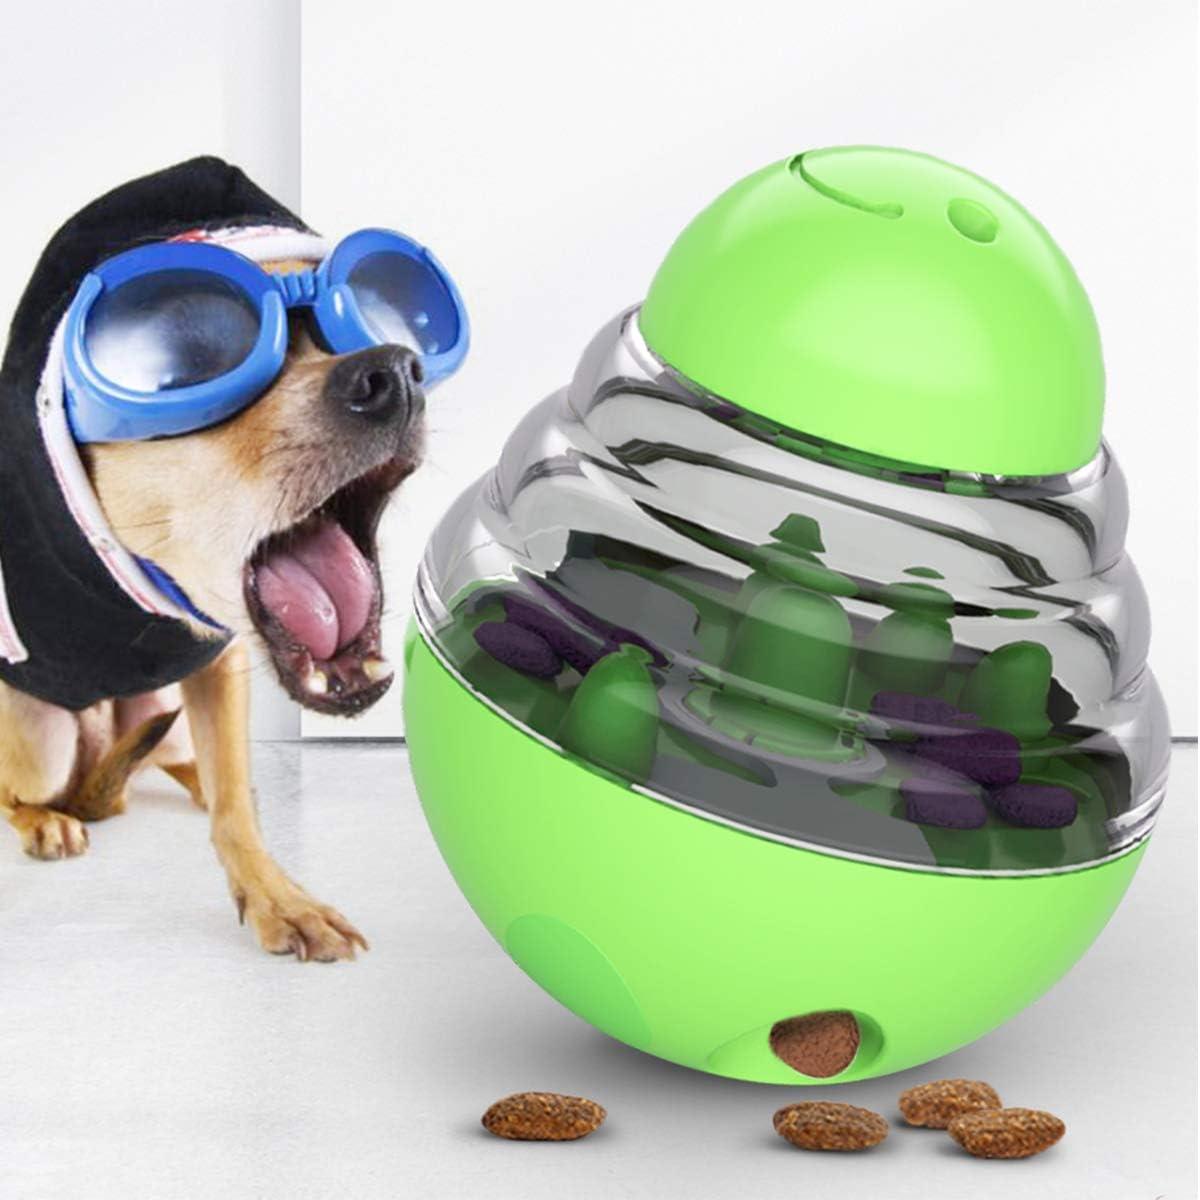 EXTREMEWORLD Tumbler Automatic Pet Slow Feeder Treat Ball Food Dispensing Dog Toy